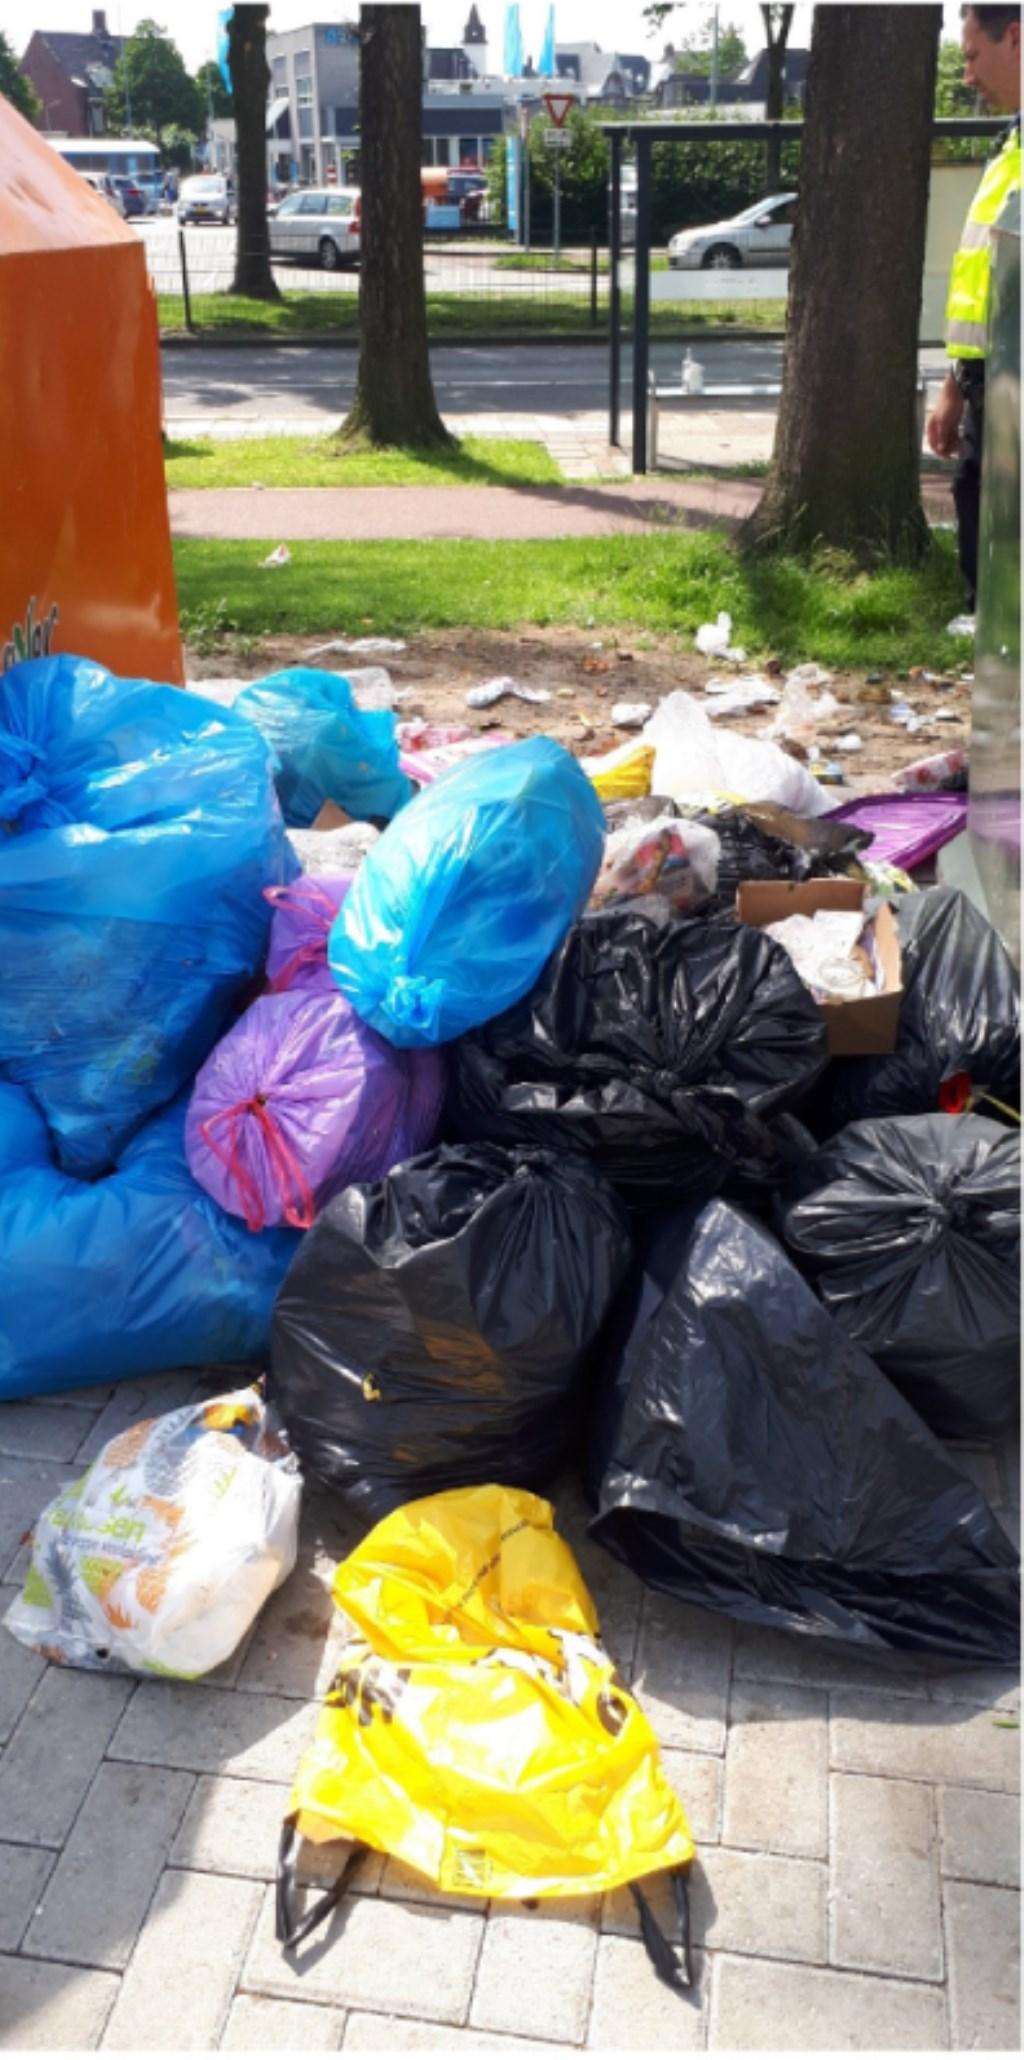 Er lag een enorme hoop afval naast de containers.  Foto: Handhaving Roosendaal © Internetbode